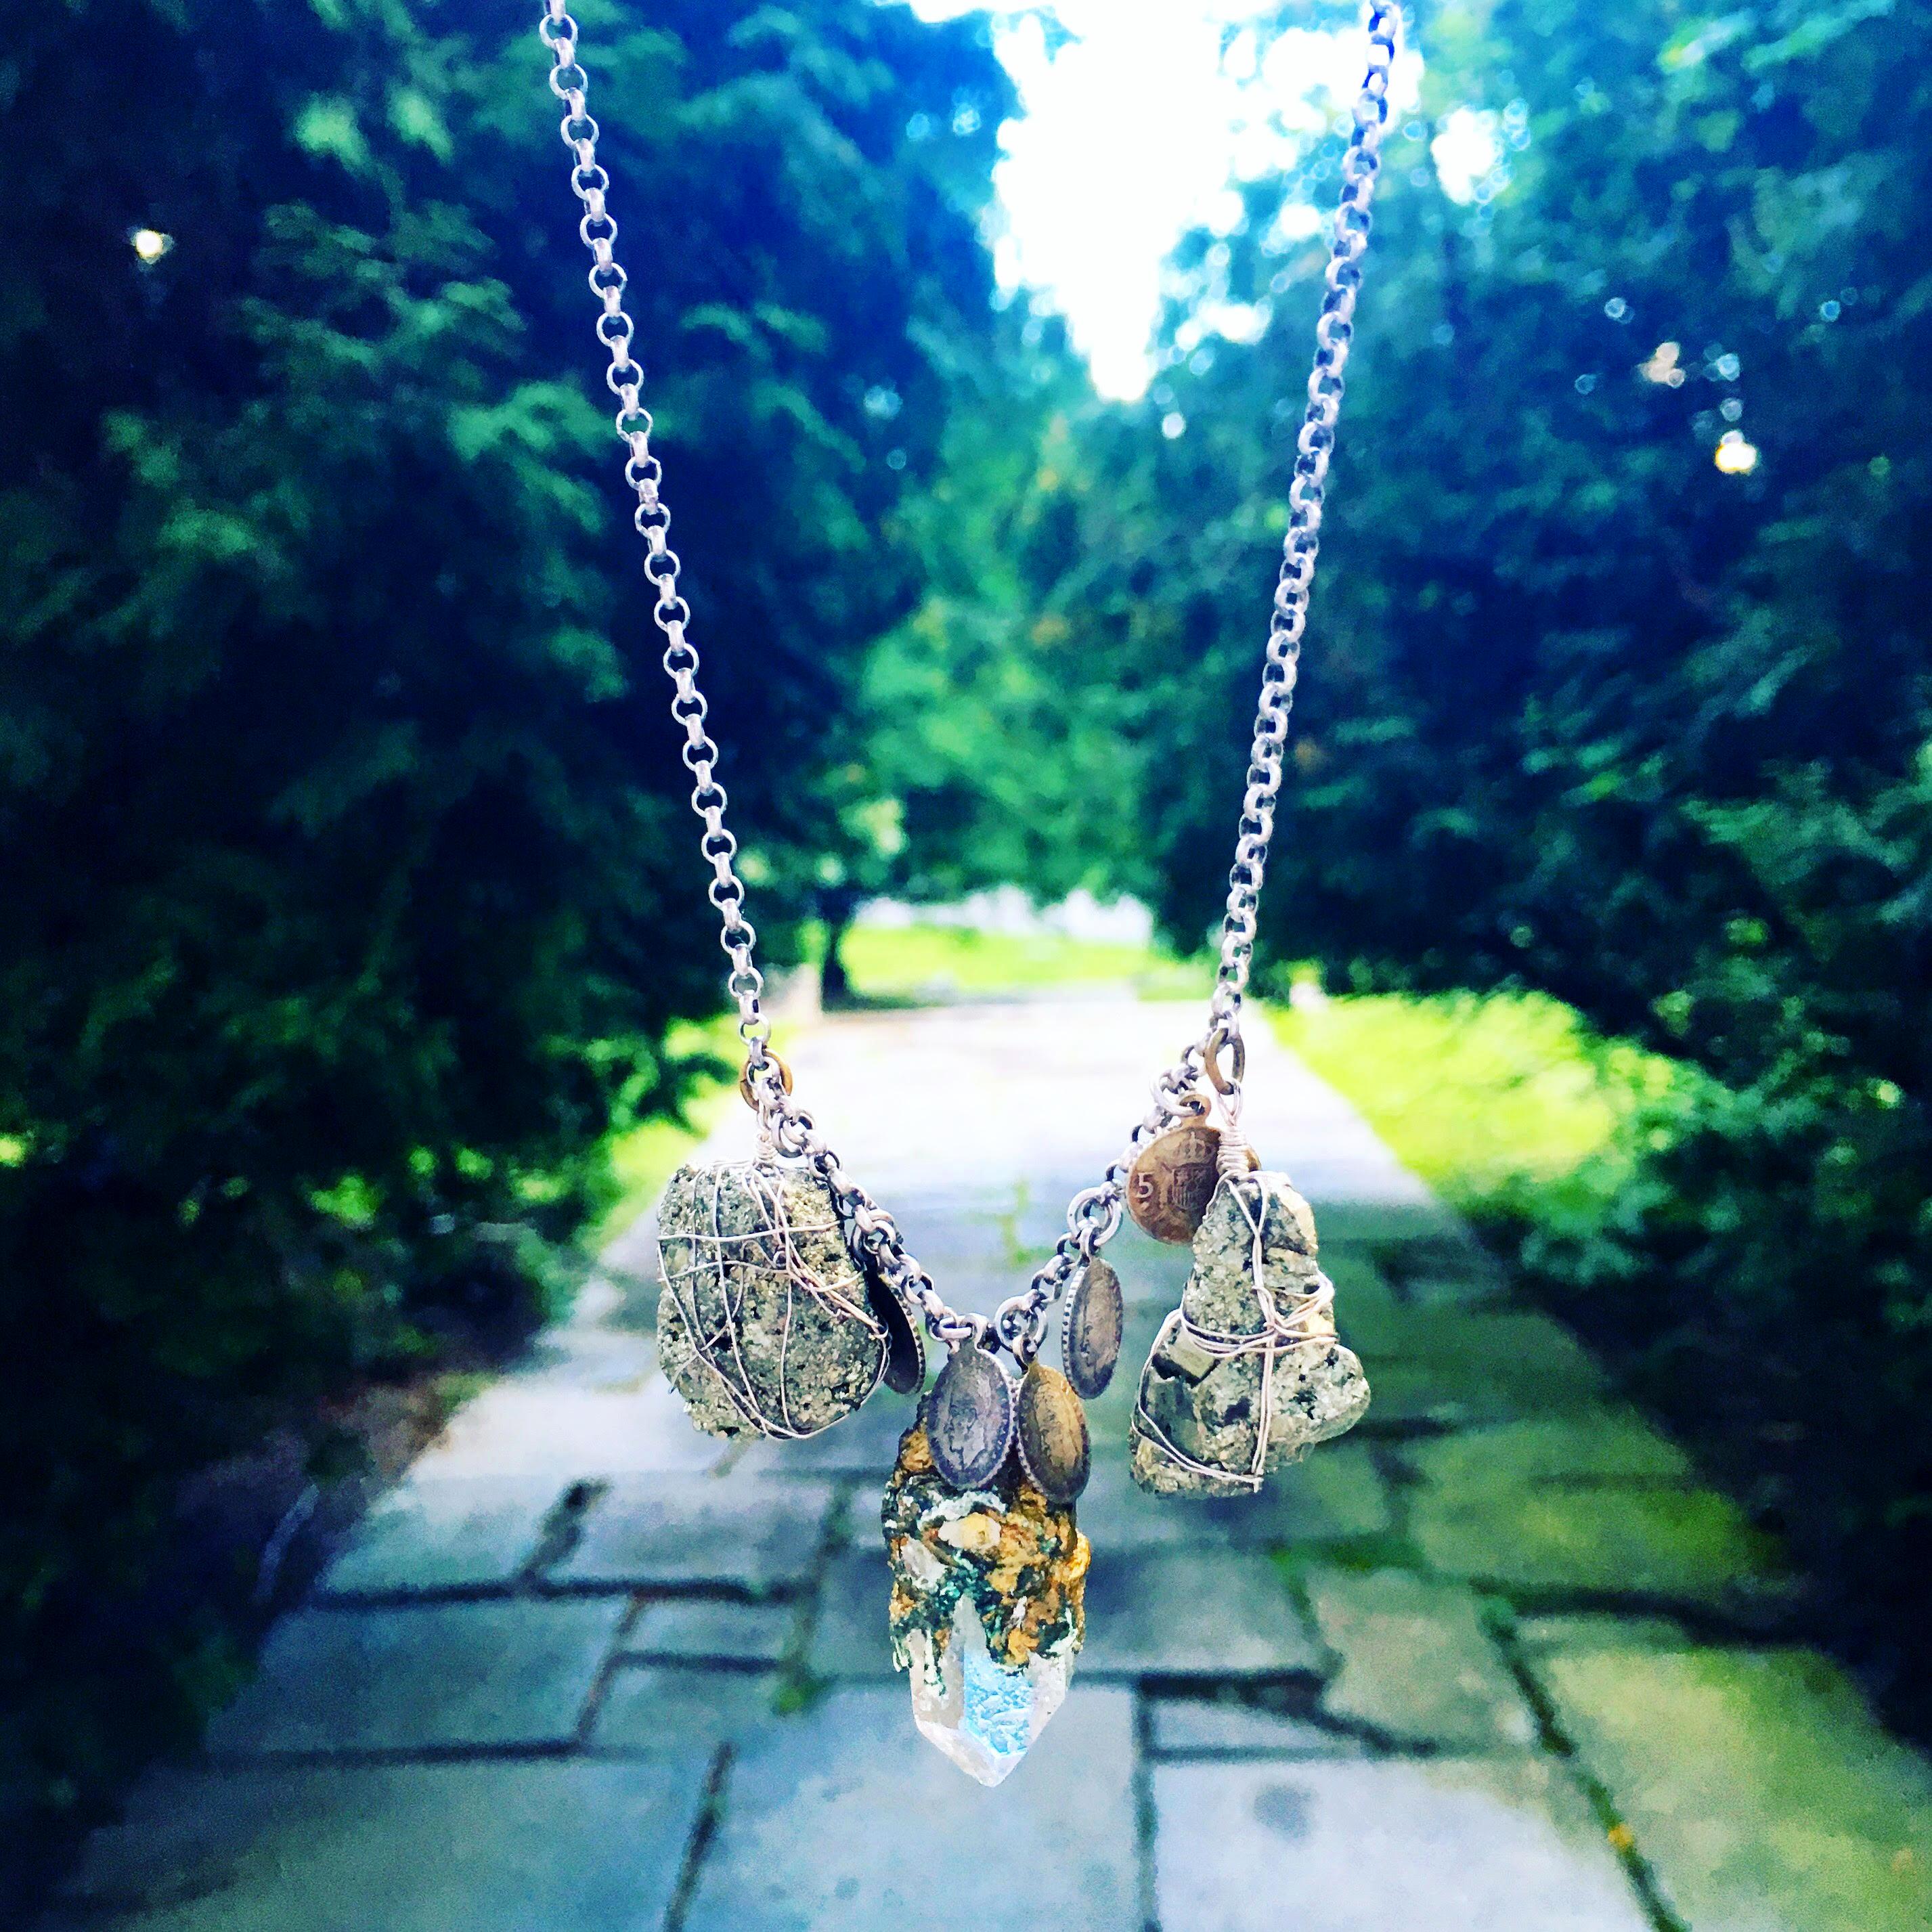 PB Wearable Art Necklace